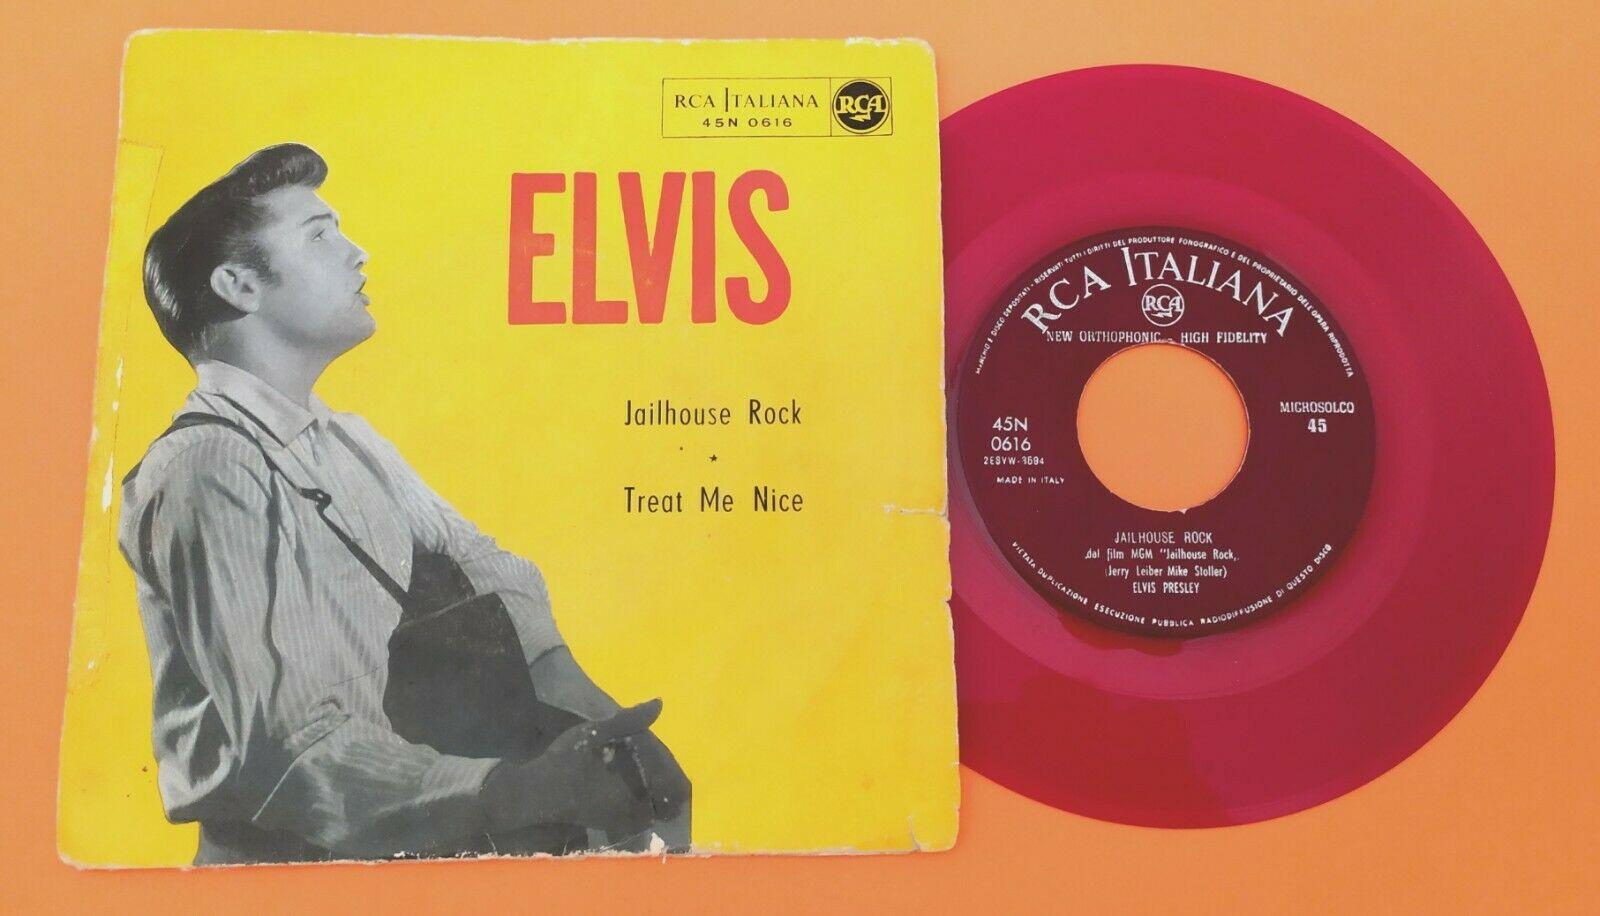 ELVIS PRESLEY  45 RPM   ITALY  45N 0616  JAILHOUSE ROCK   MEGA RARE RED LABEL